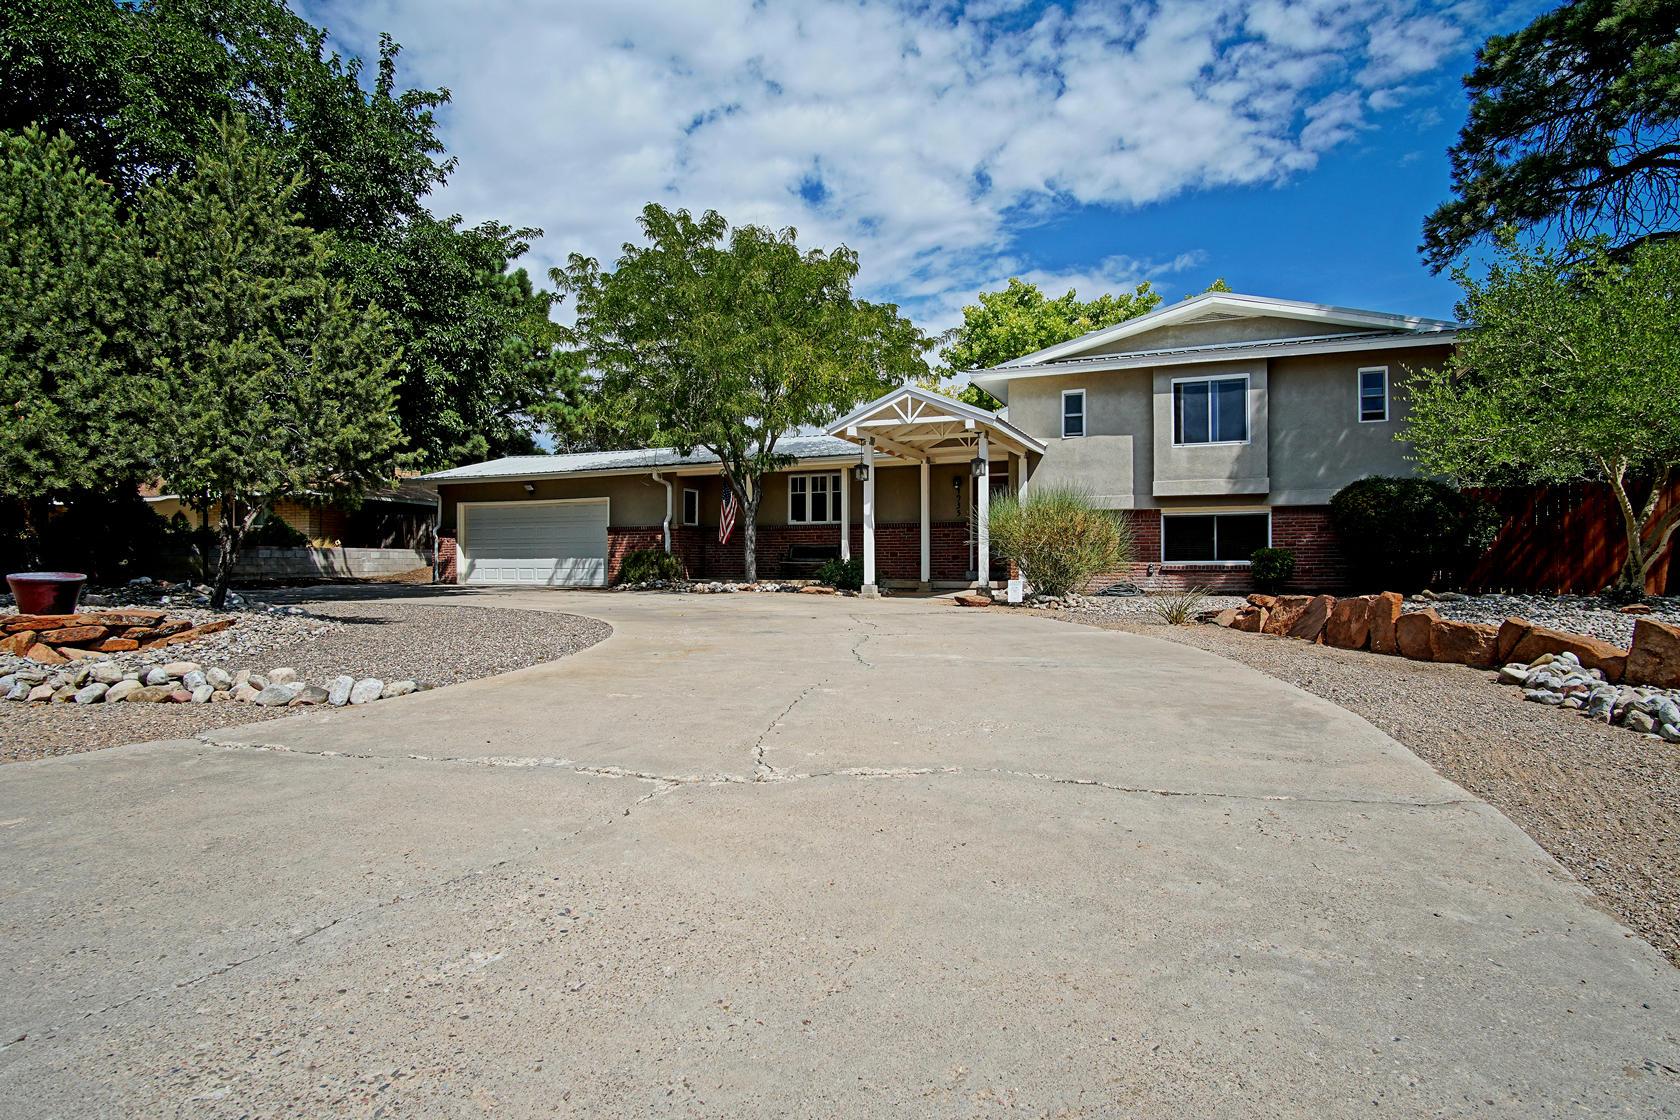 4935 NW Fairfax Drive, Northwest Albuquerque and Northwest Heights, New Mexico